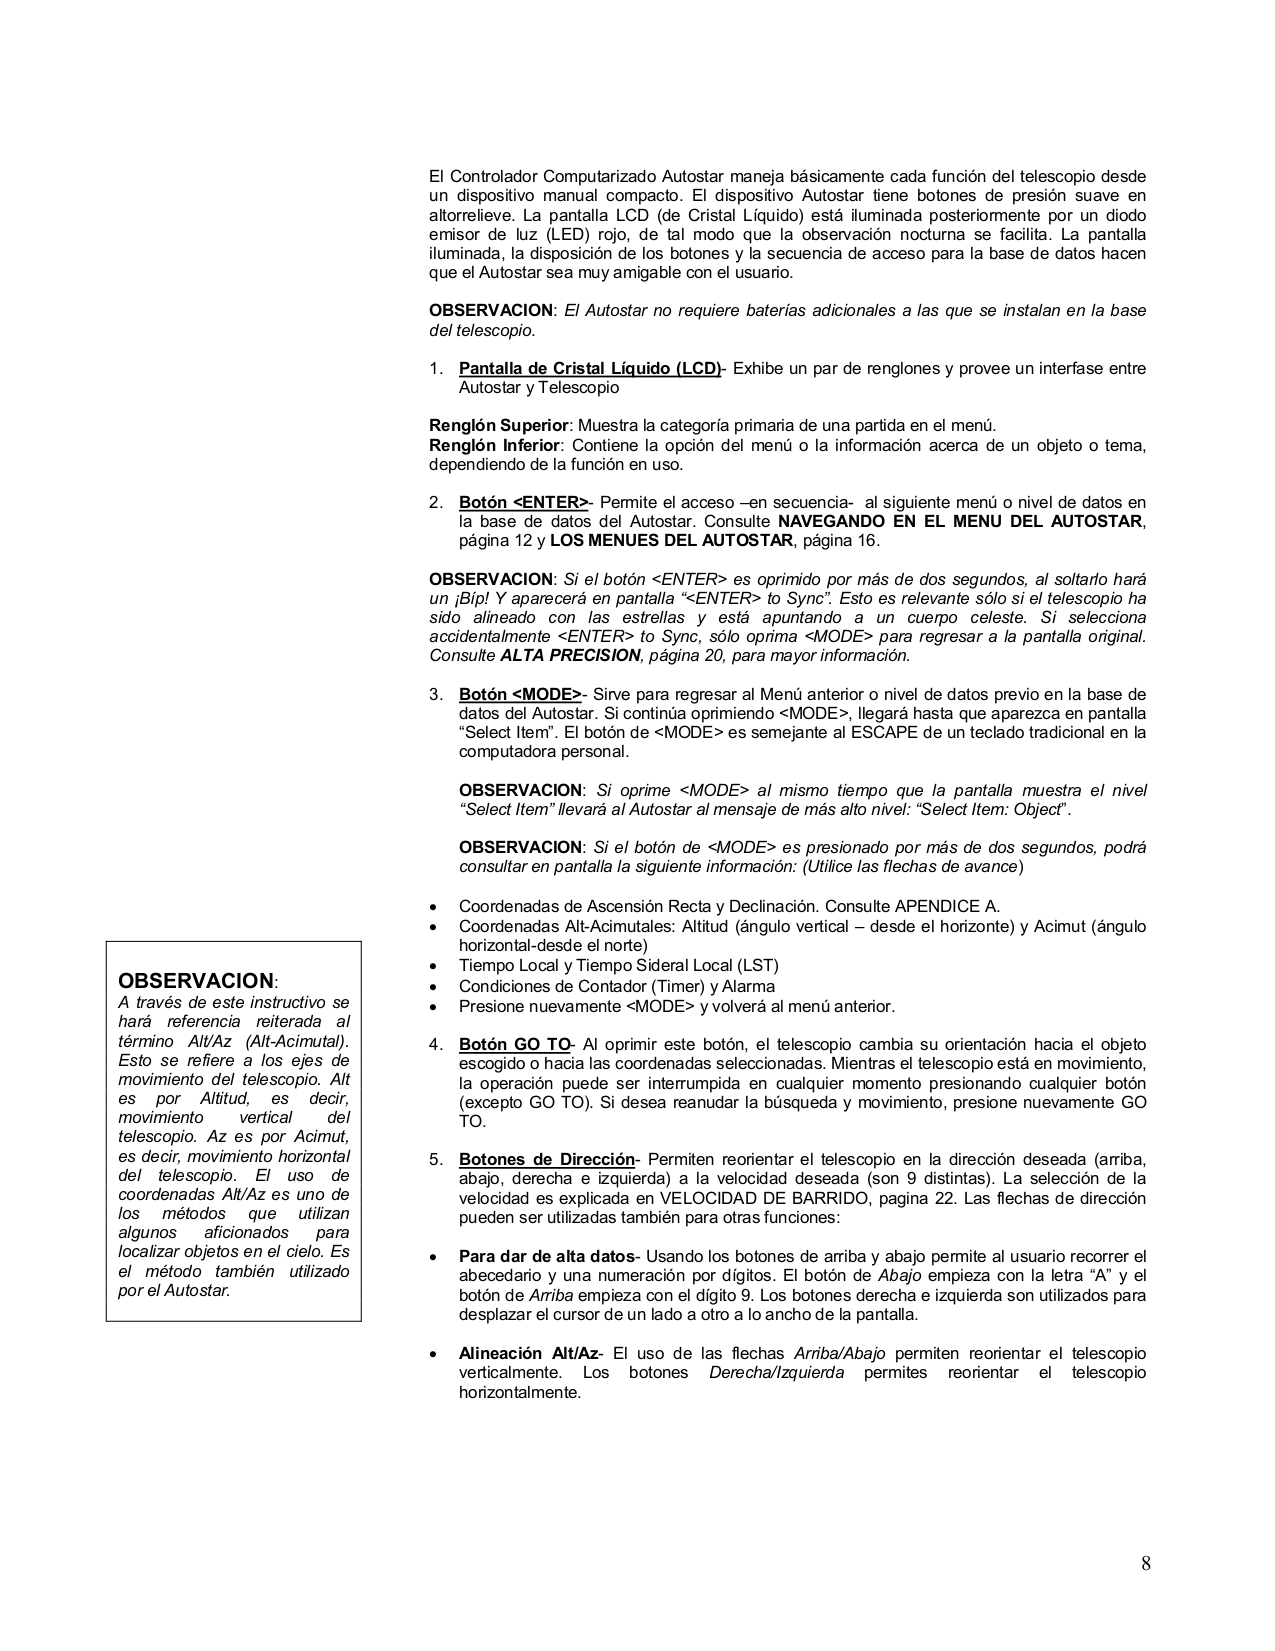 PDF manual for Meade Telescope ETX-70AT